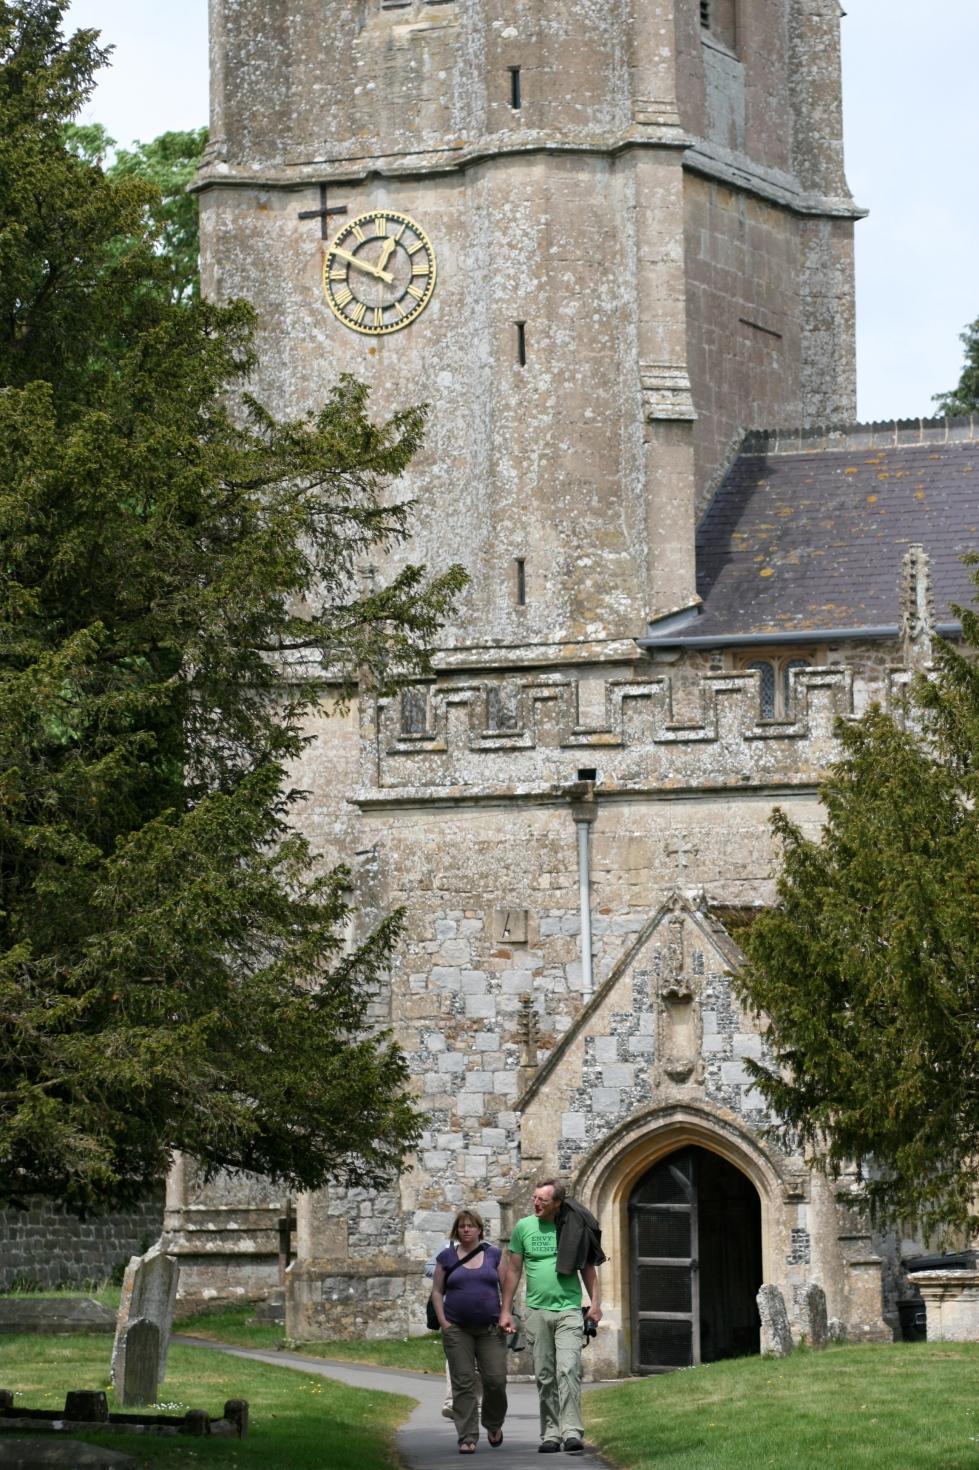 Avebury, Avebury church, travel, photography, travel photography, travel photos, Bath Spa travel photography, Bath Spa travel photos, Avebury travel photography